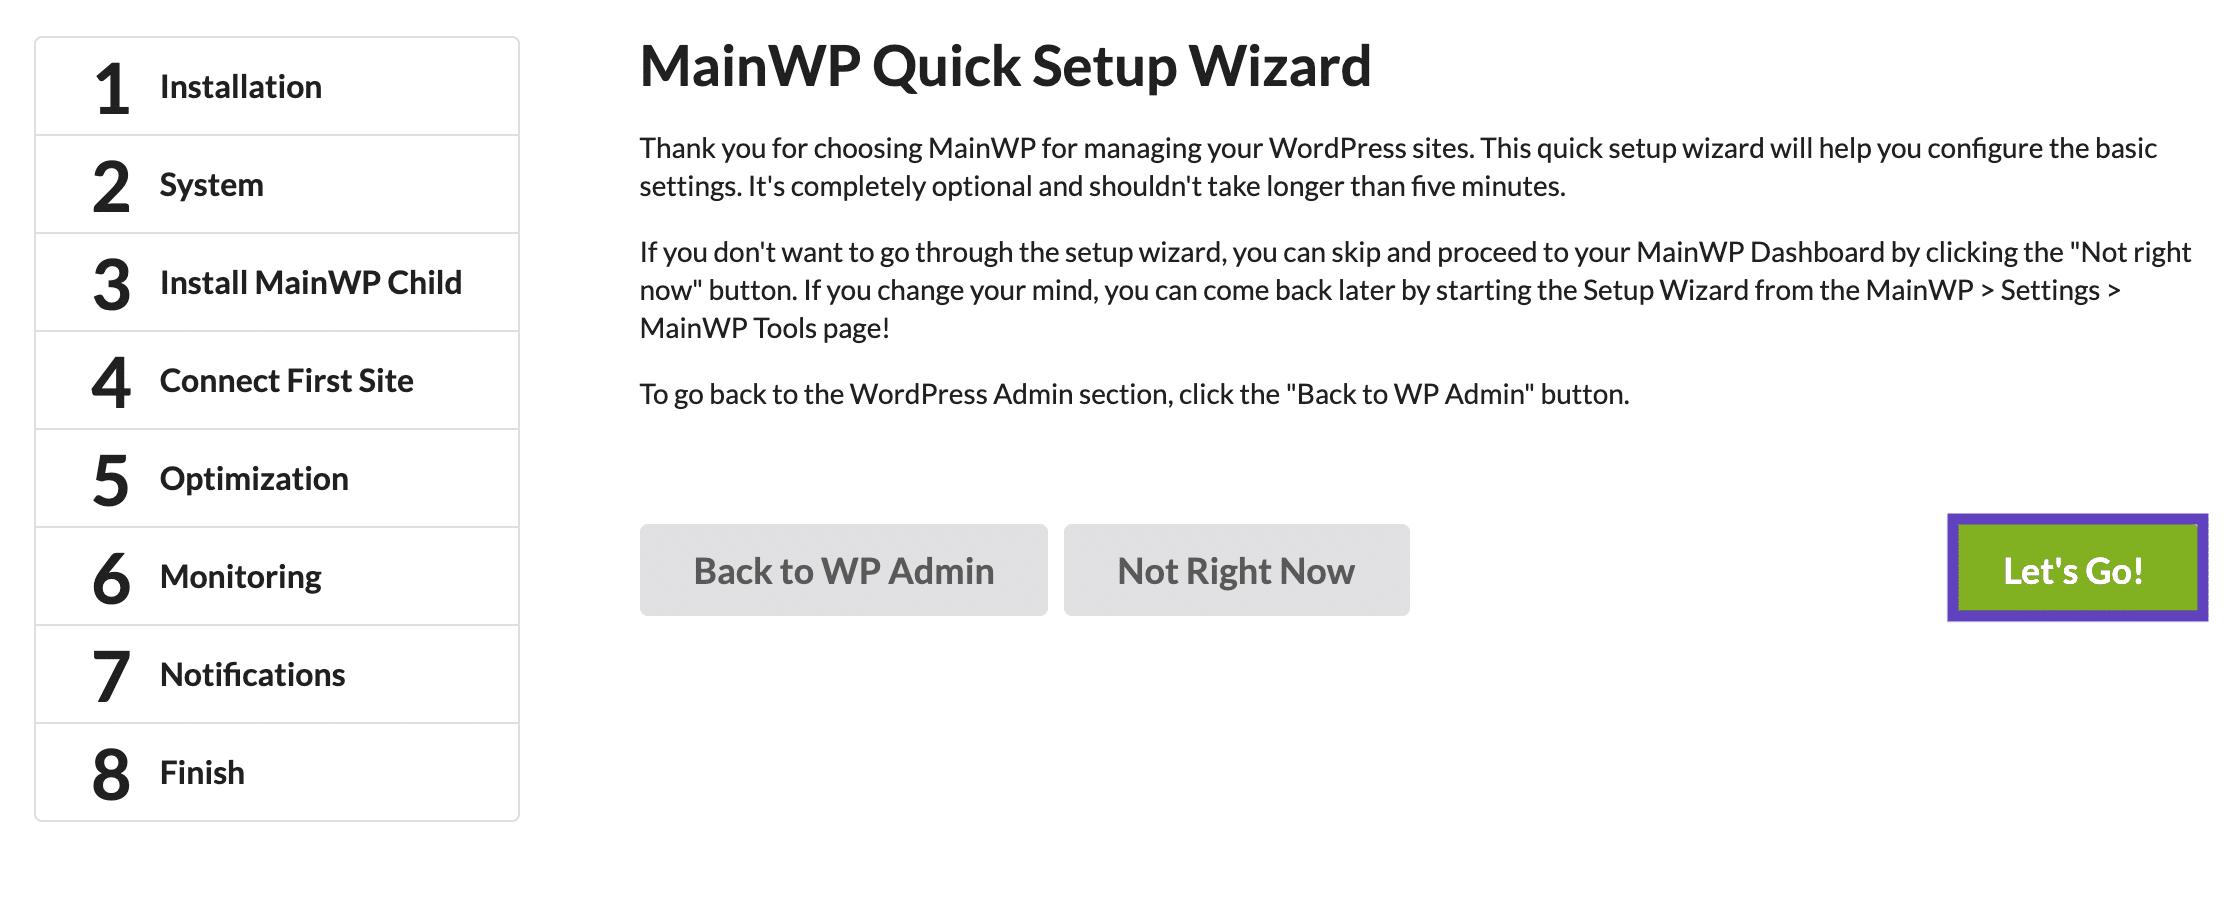 MainWP Quick Setup Wizard